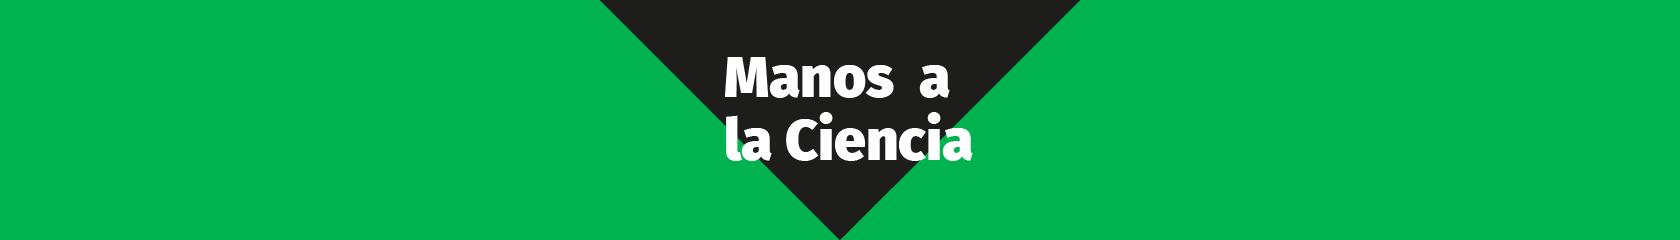 MANOS1_